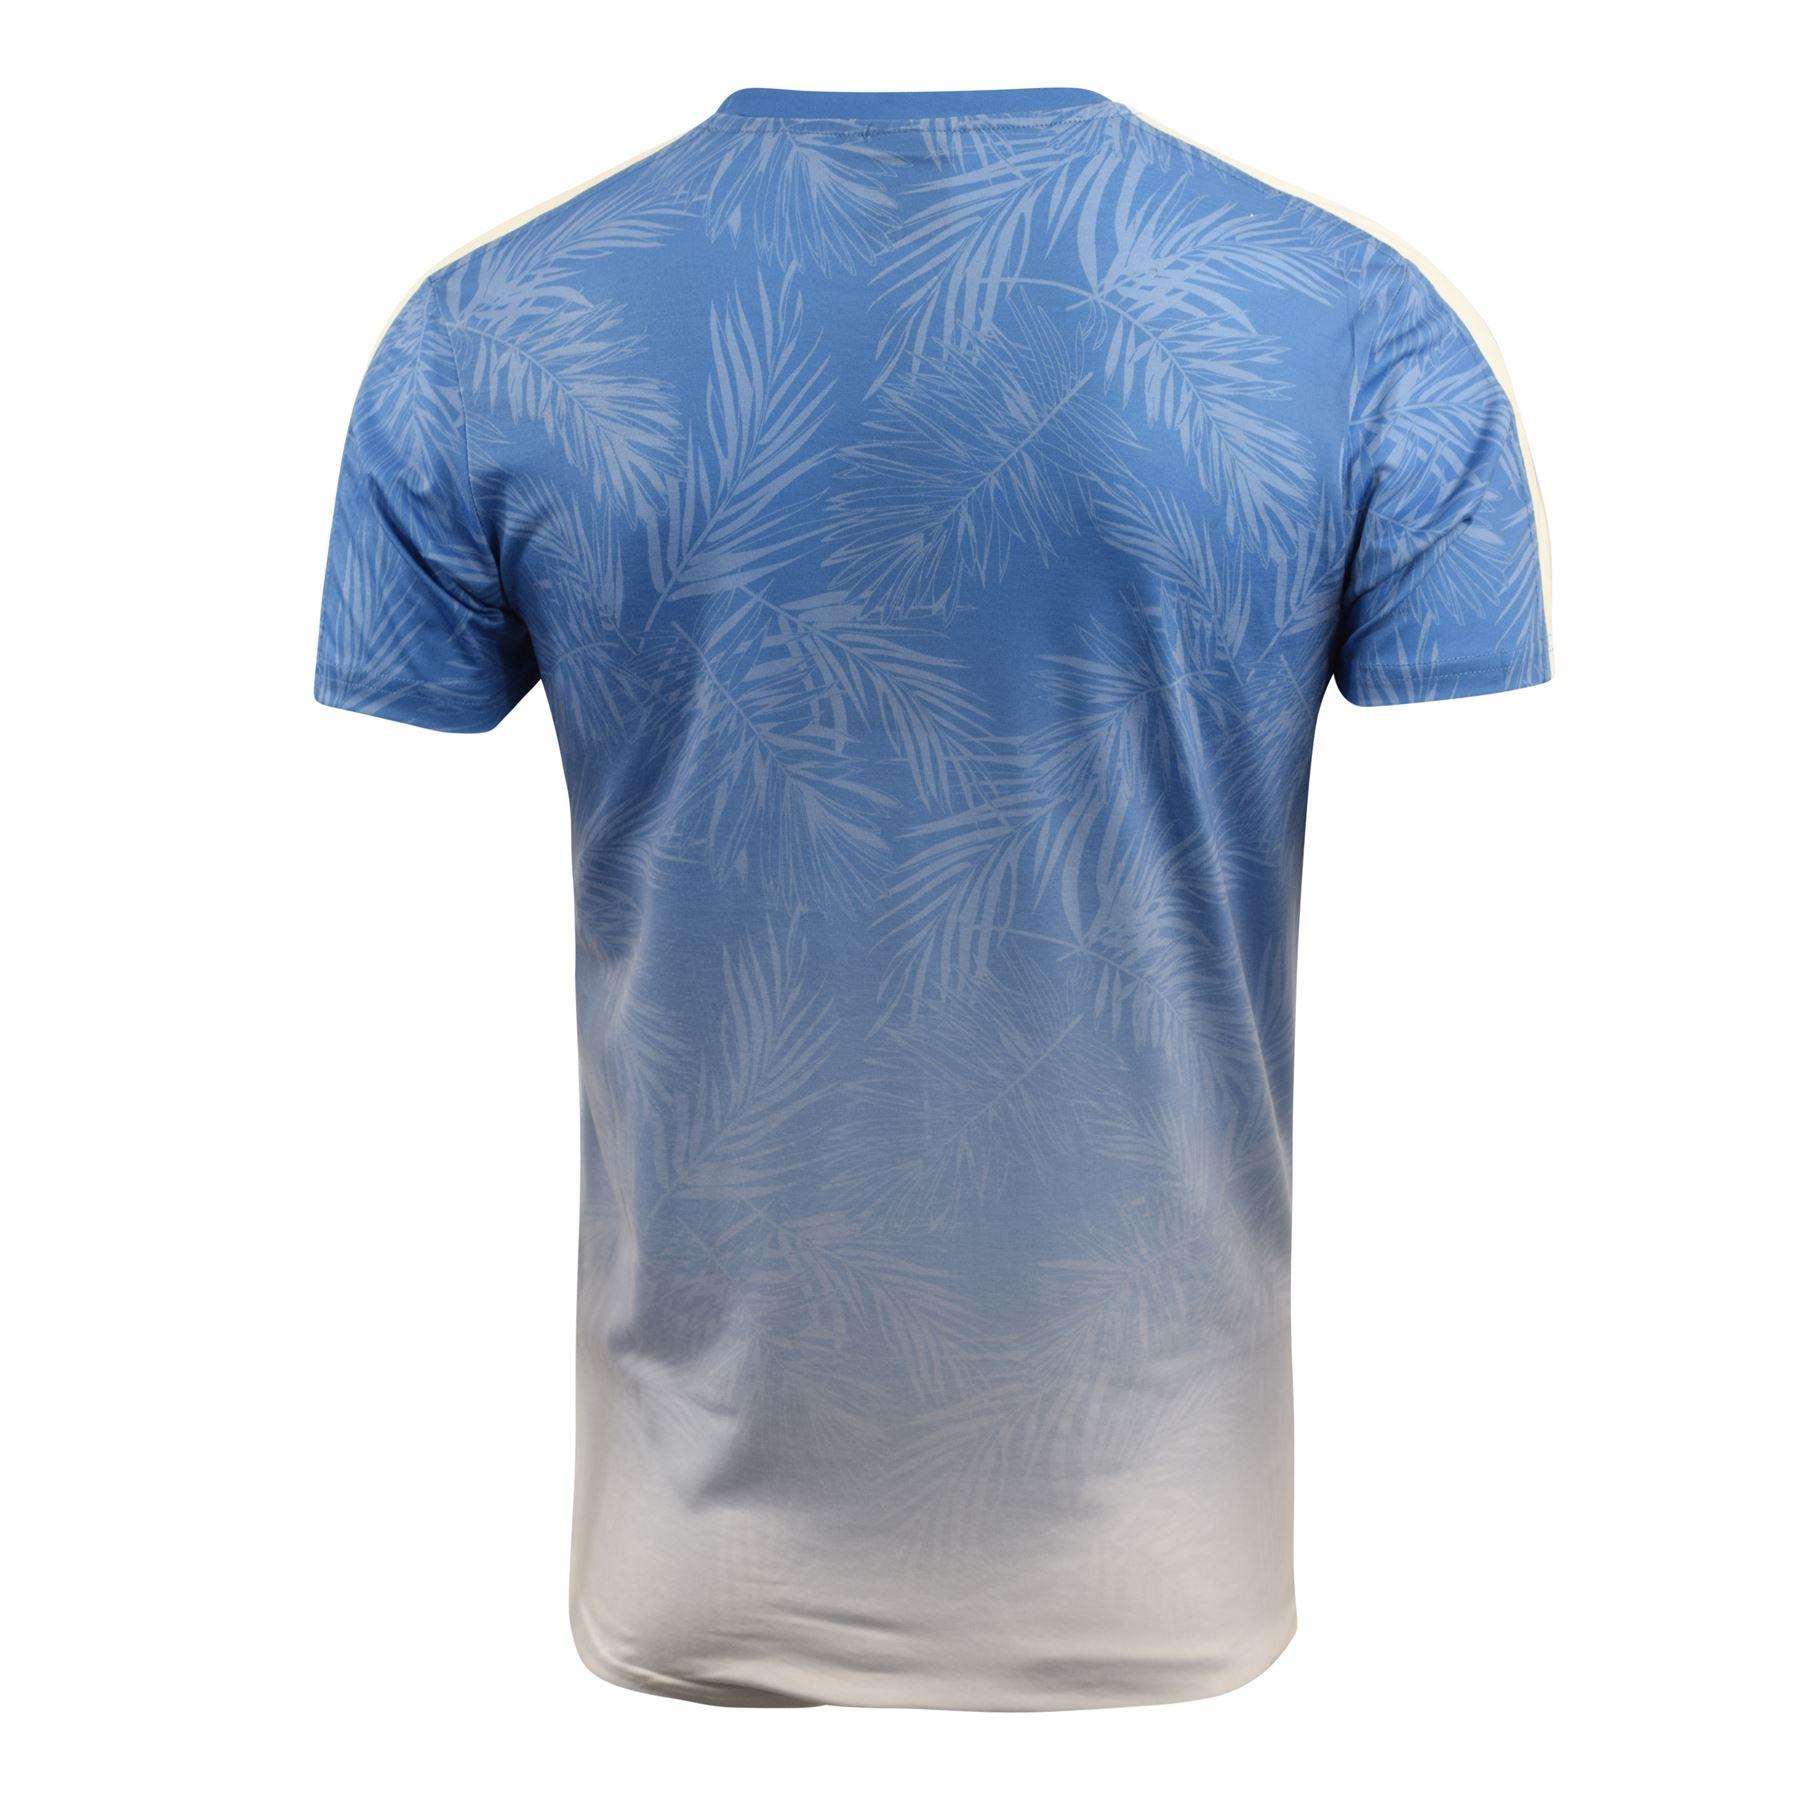 Mens-Crosshatch-T-Shirt-Contrast-Short-Sleeve-Tee-Top-Salifornia thumbnail 6